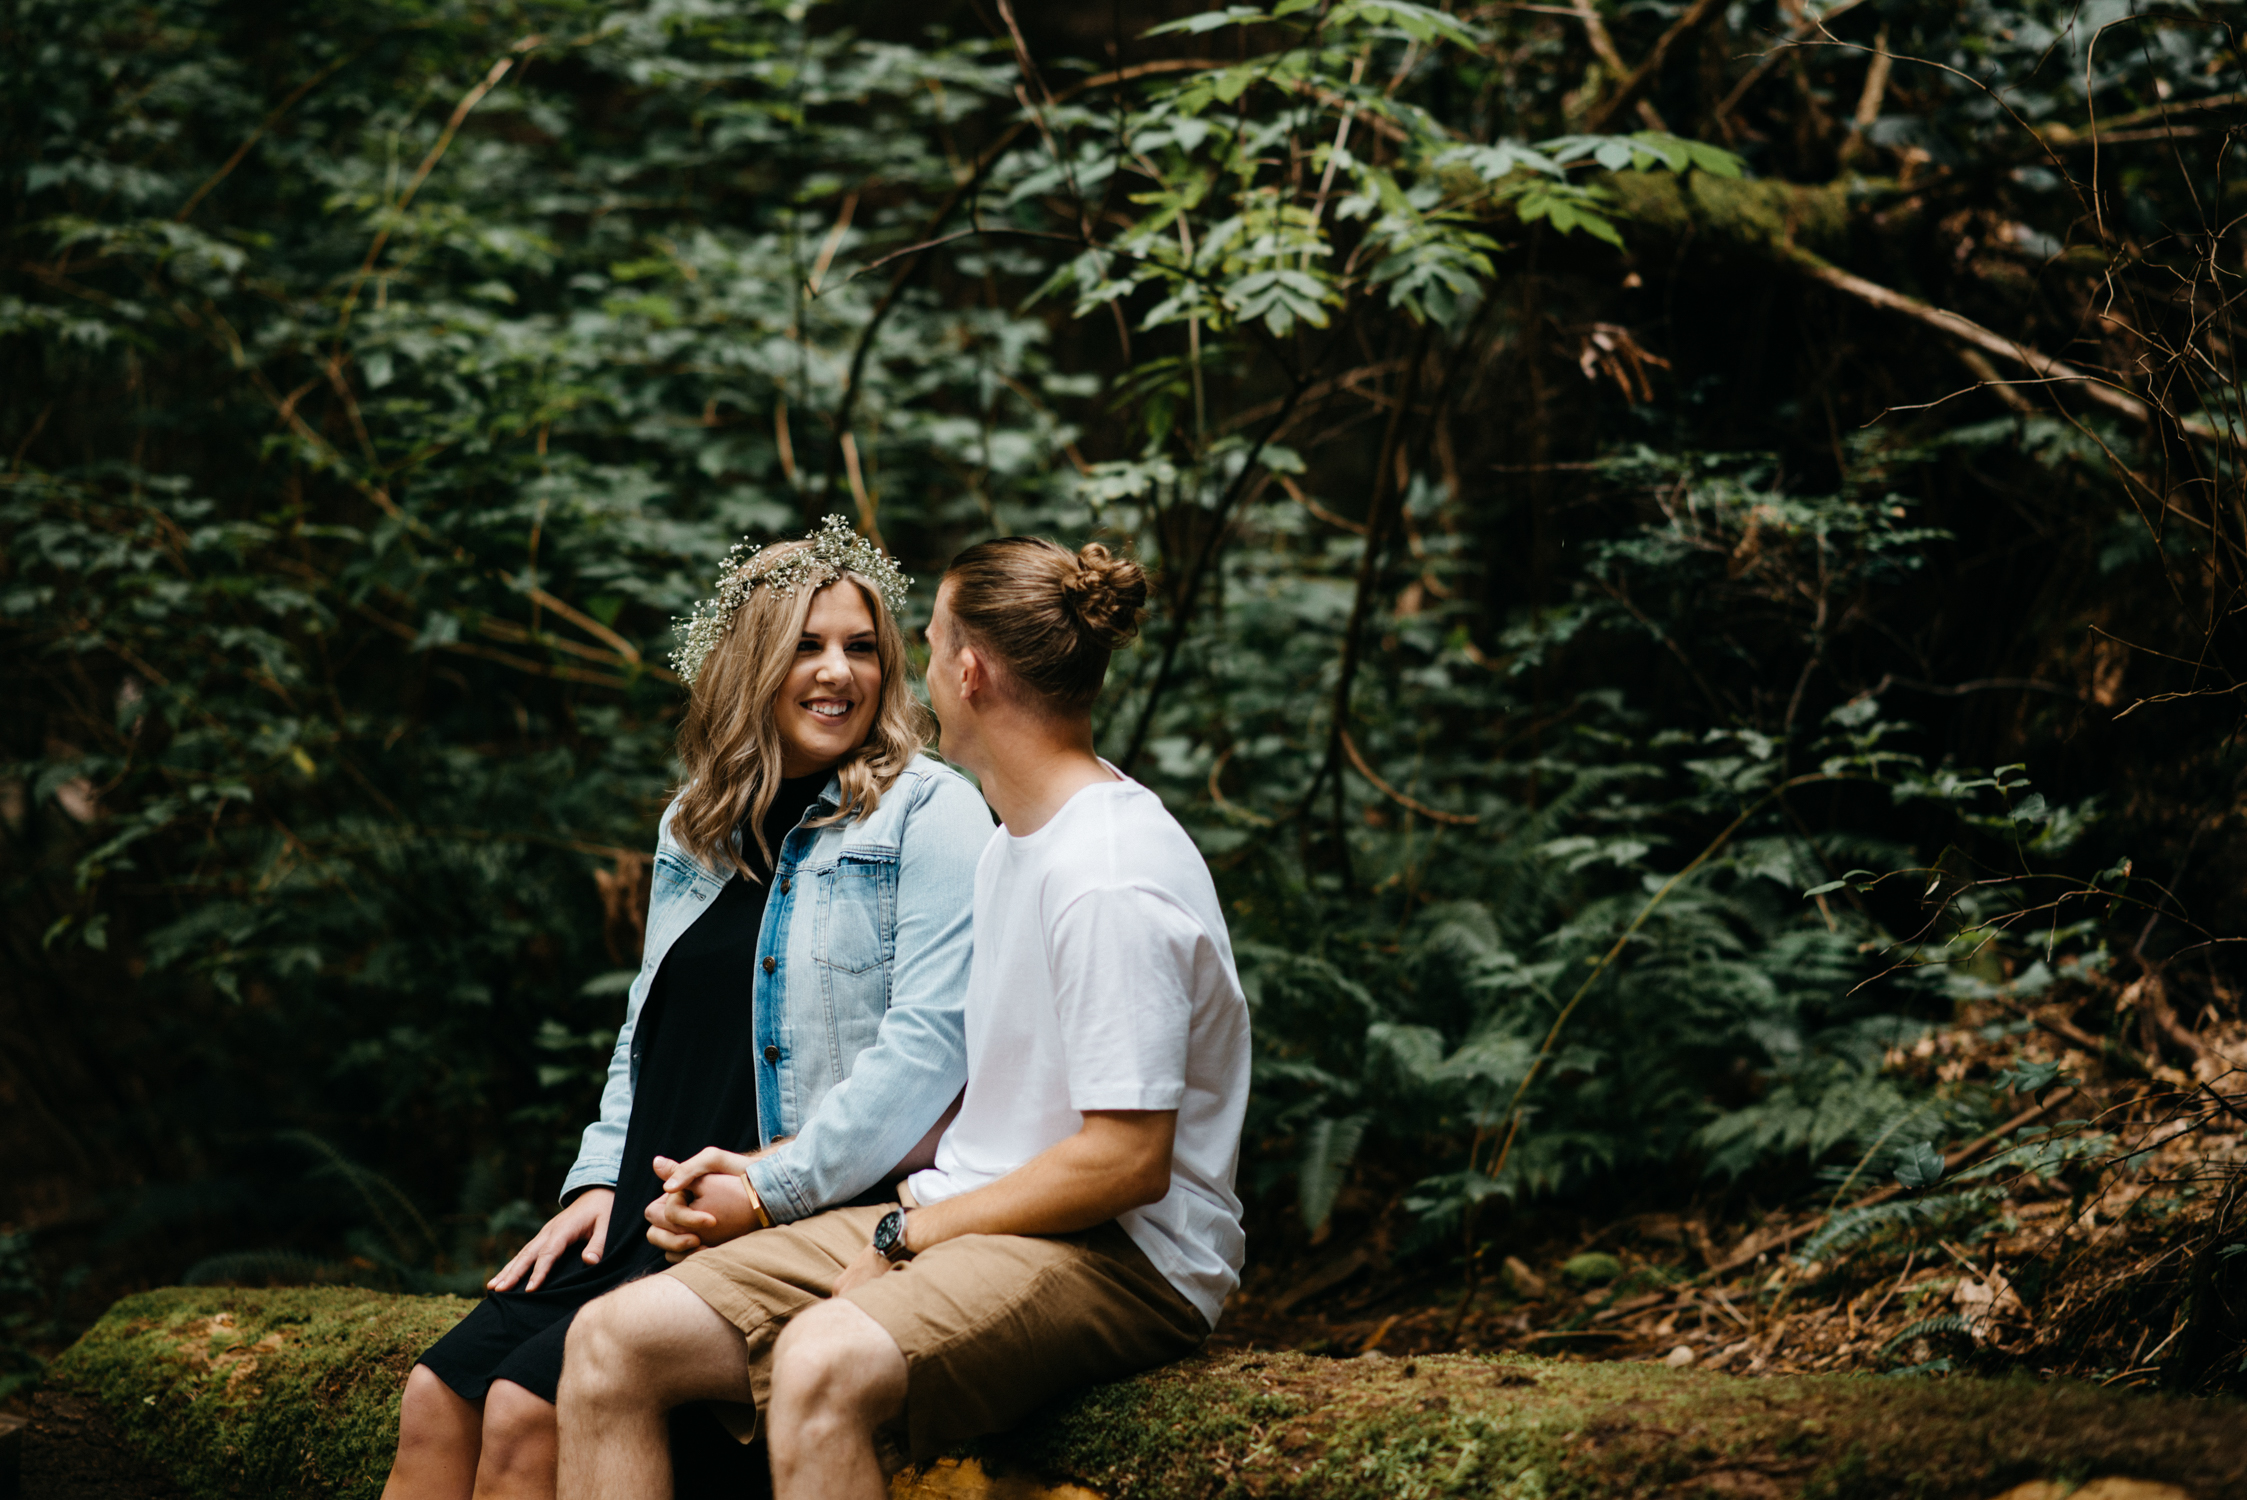 001_Lighthouse_Park_Engagement_Vancouver.jpg